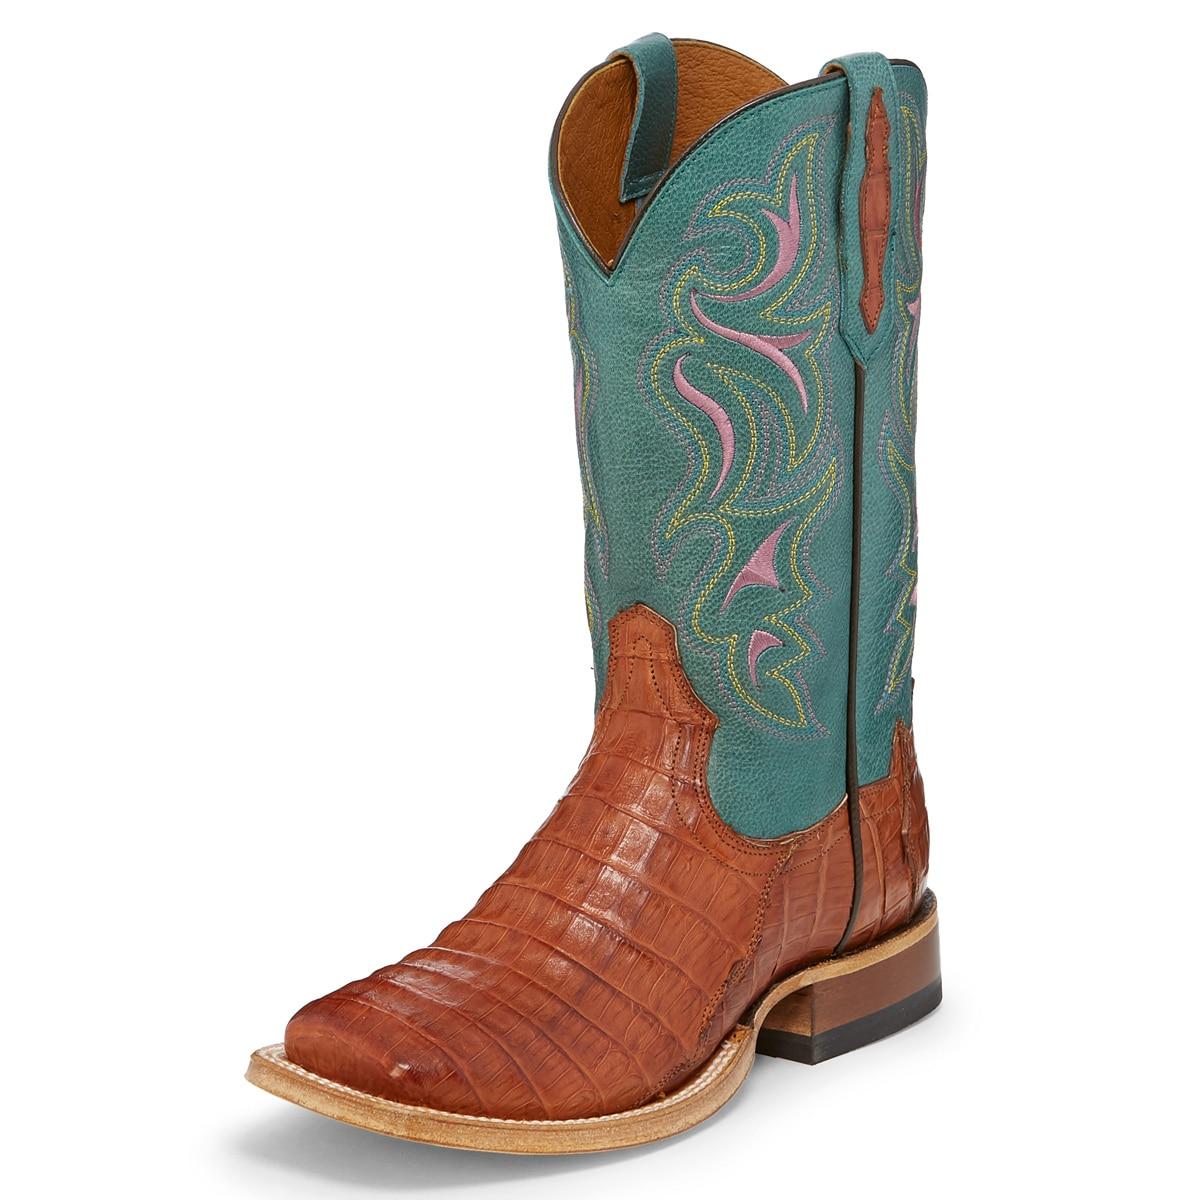 Tony Lama Women's Sonora Boot - Congnac